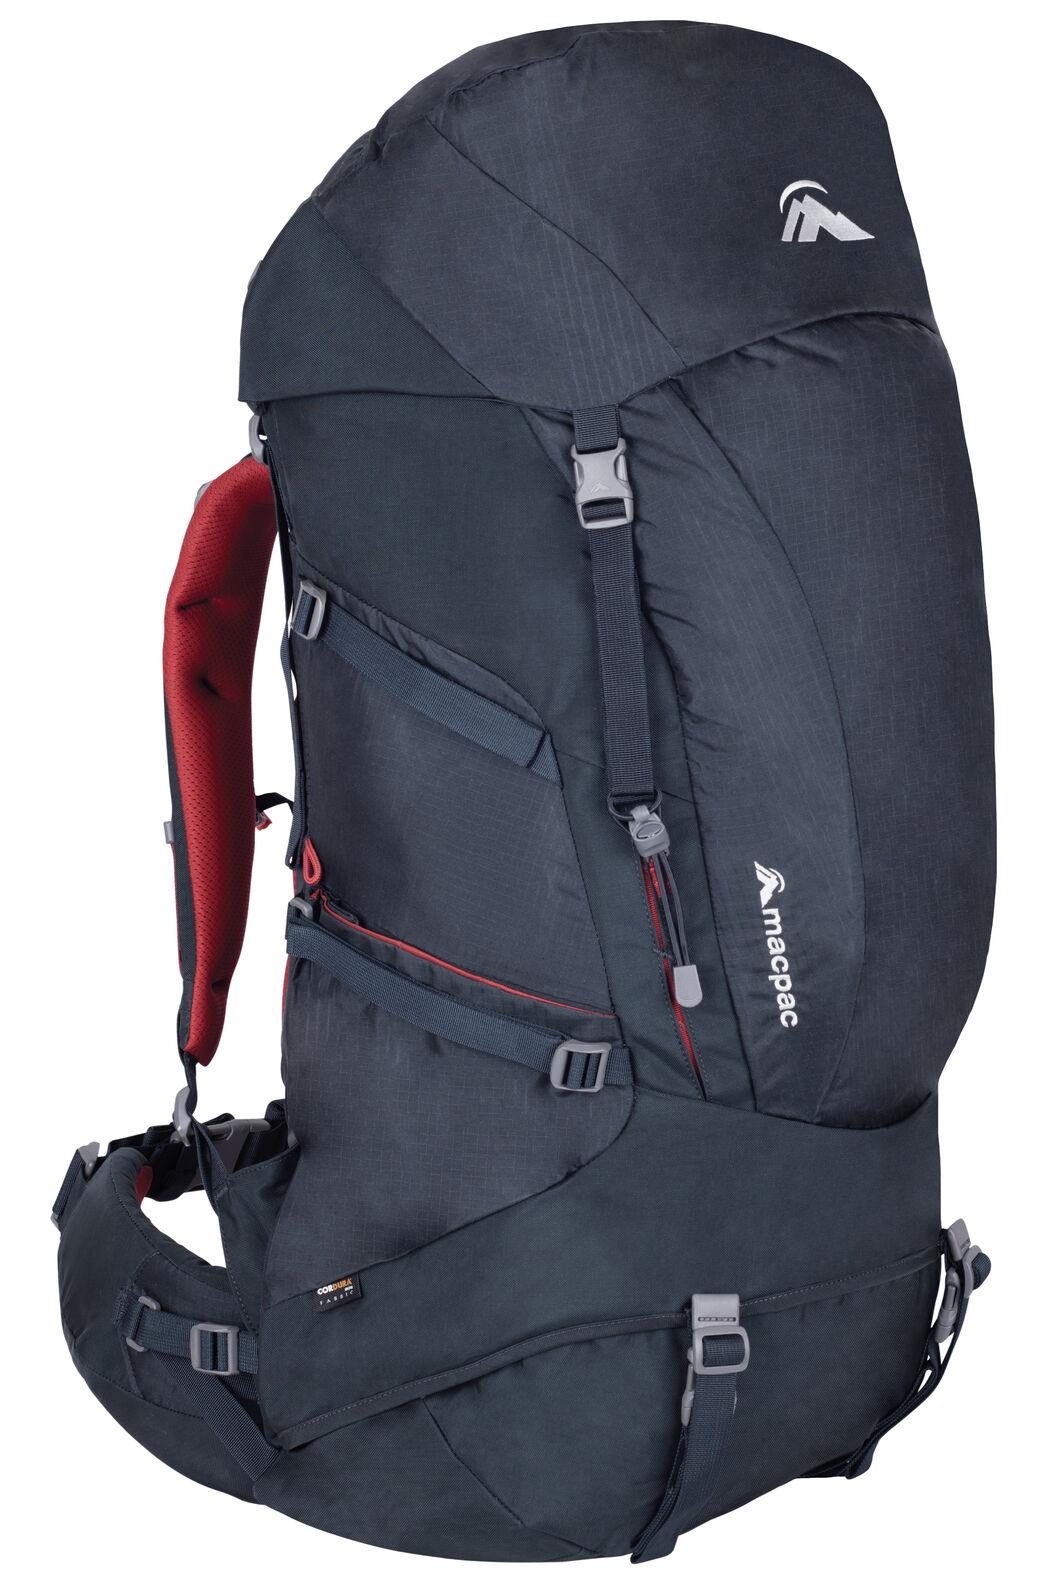 Macpac Torlesse 50L Pack V2, Carbon, hi-res